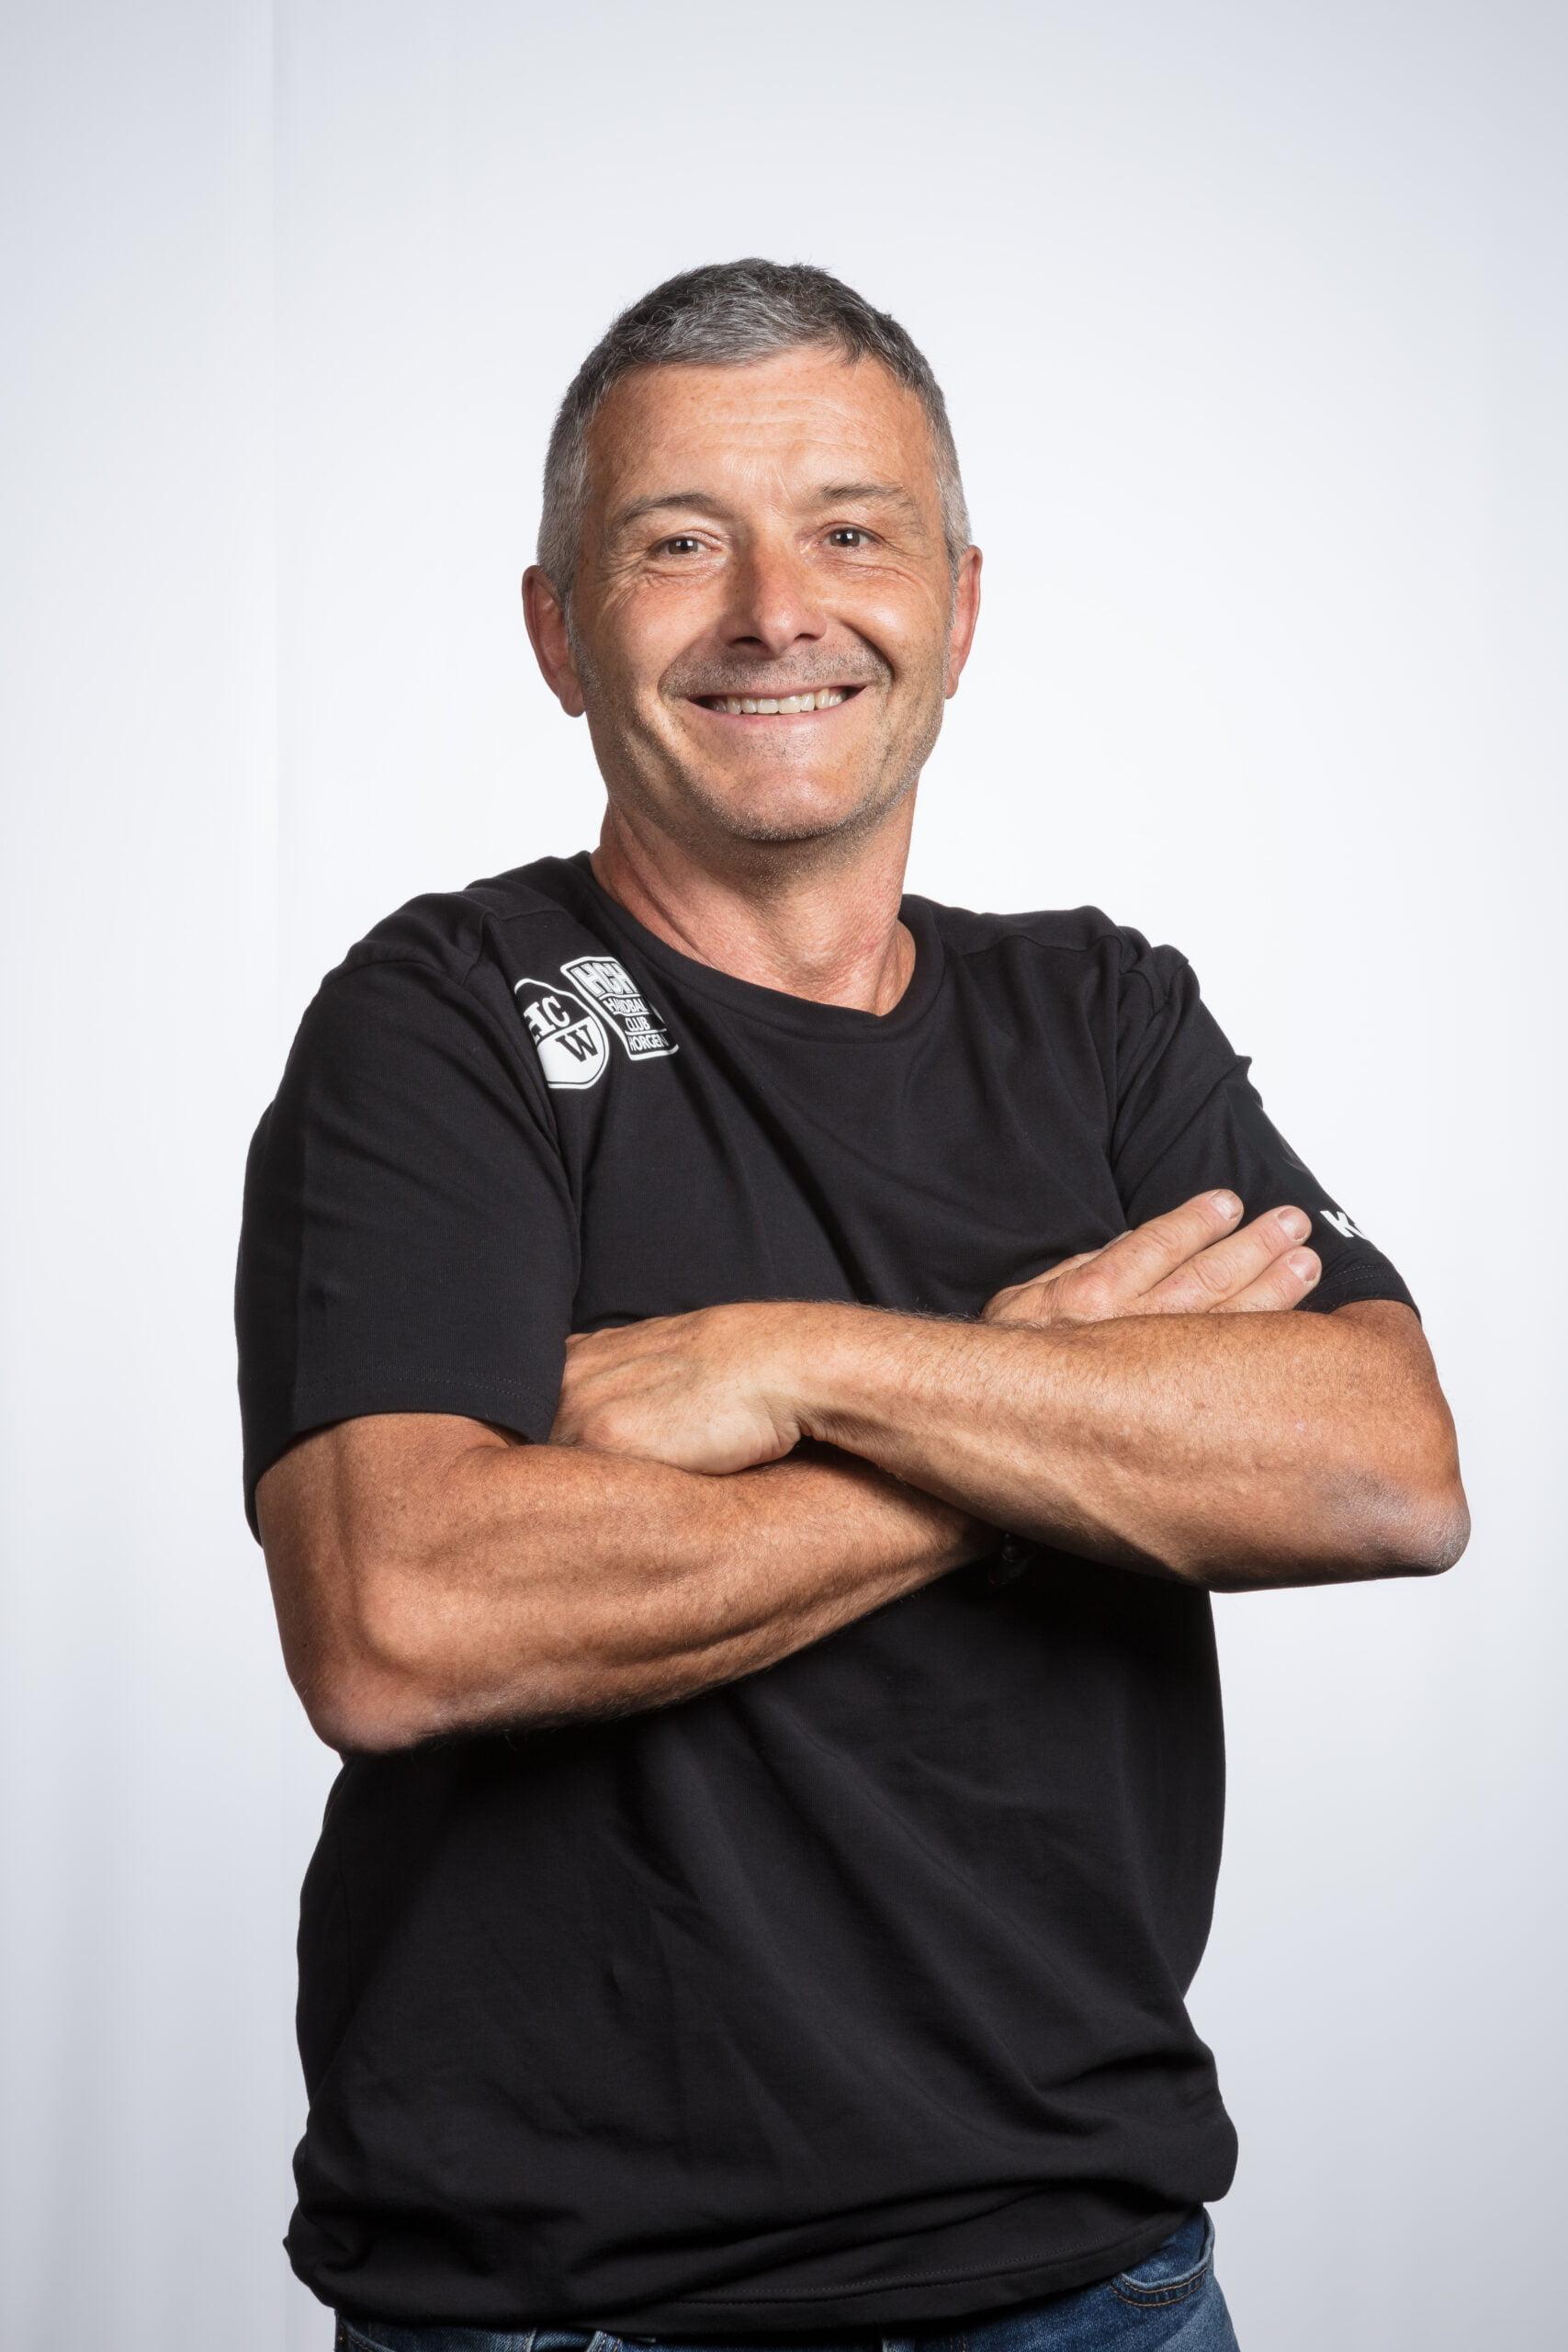 Markus Gretler